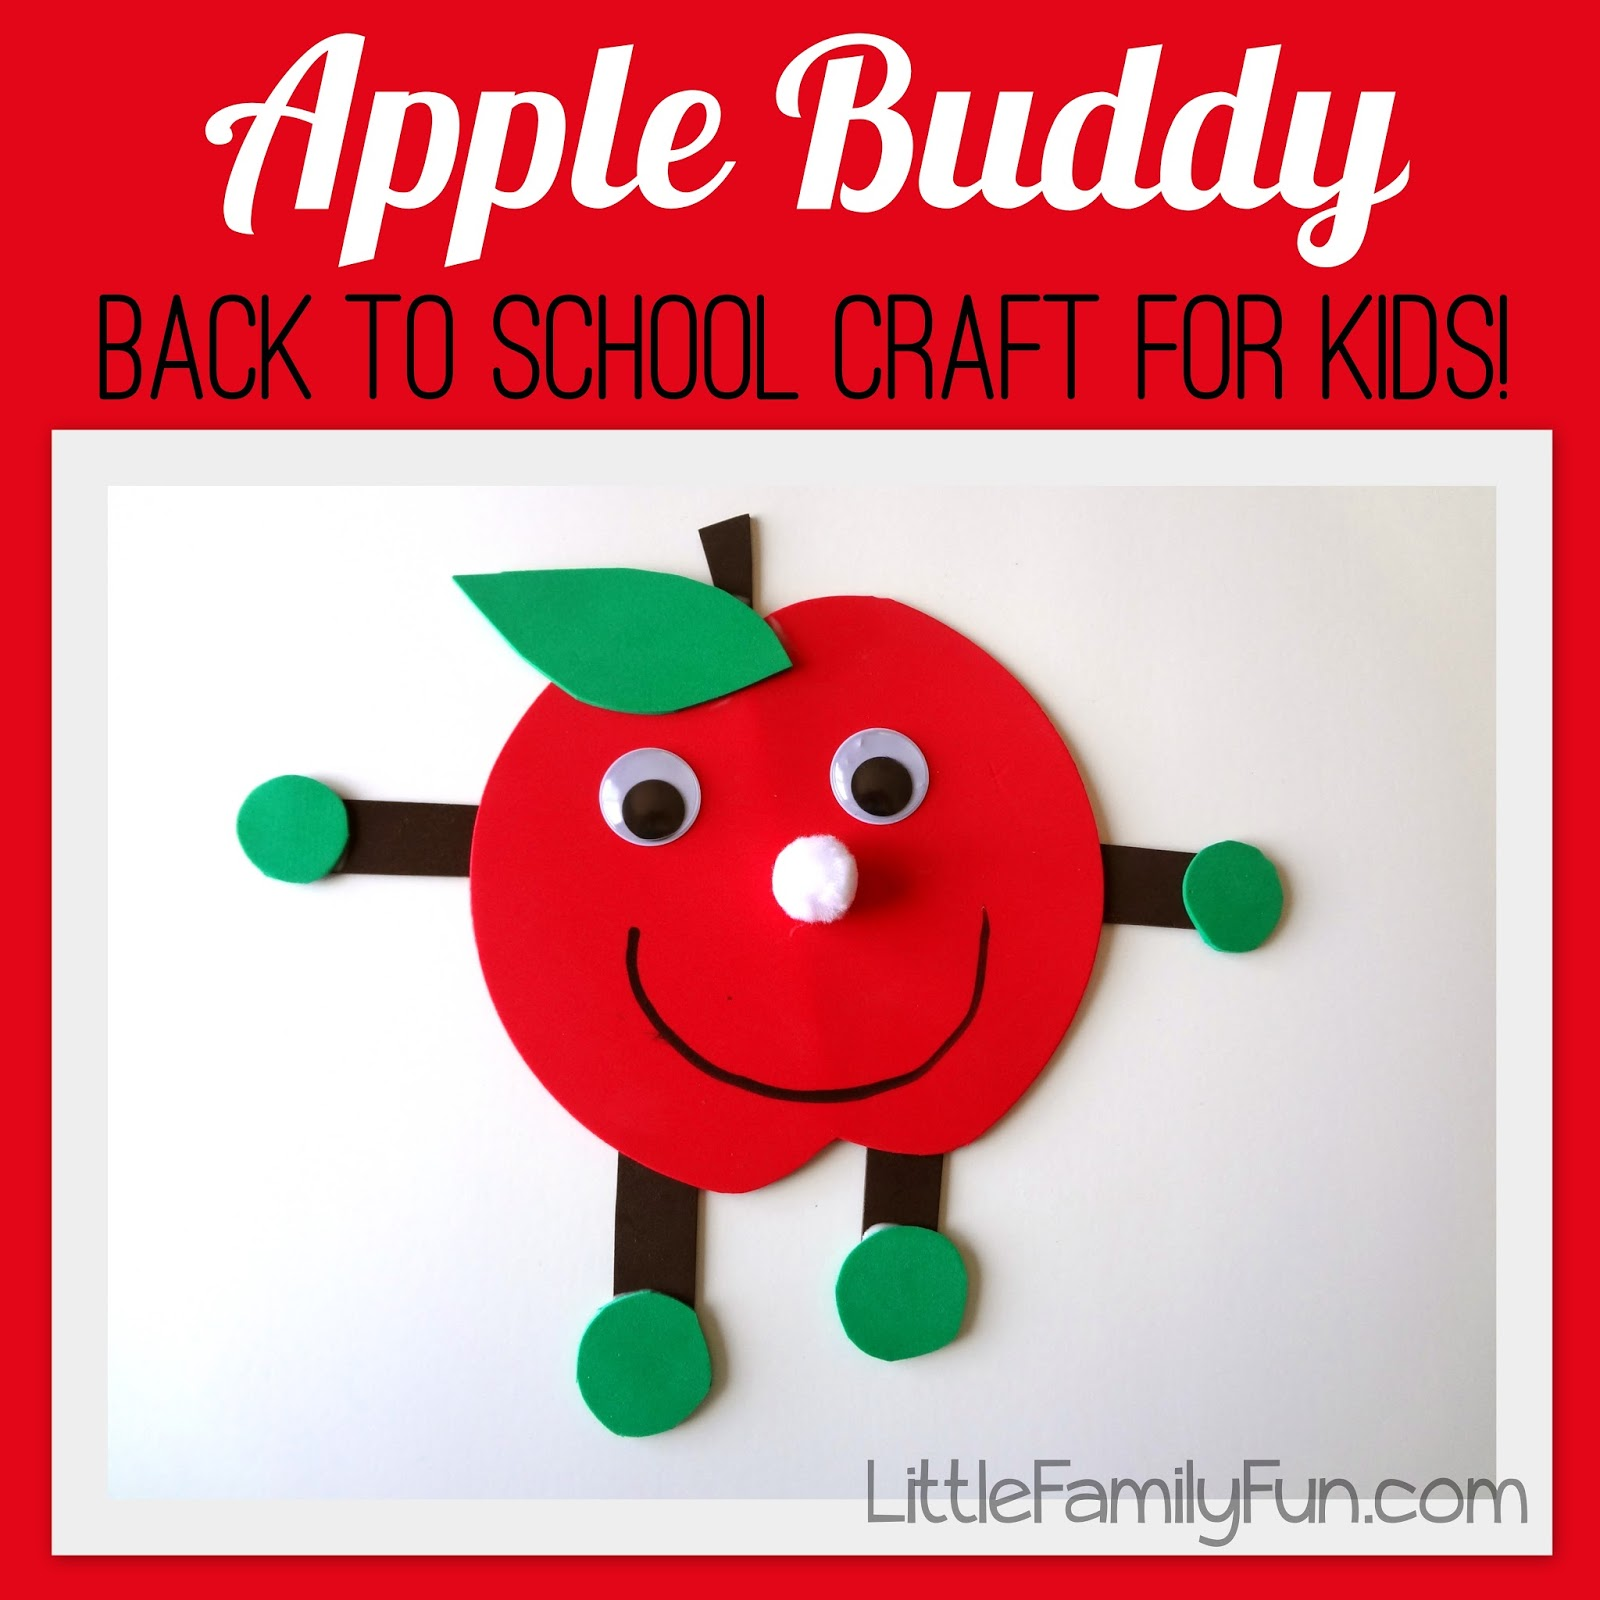 Little Family Fun Apple Buddy